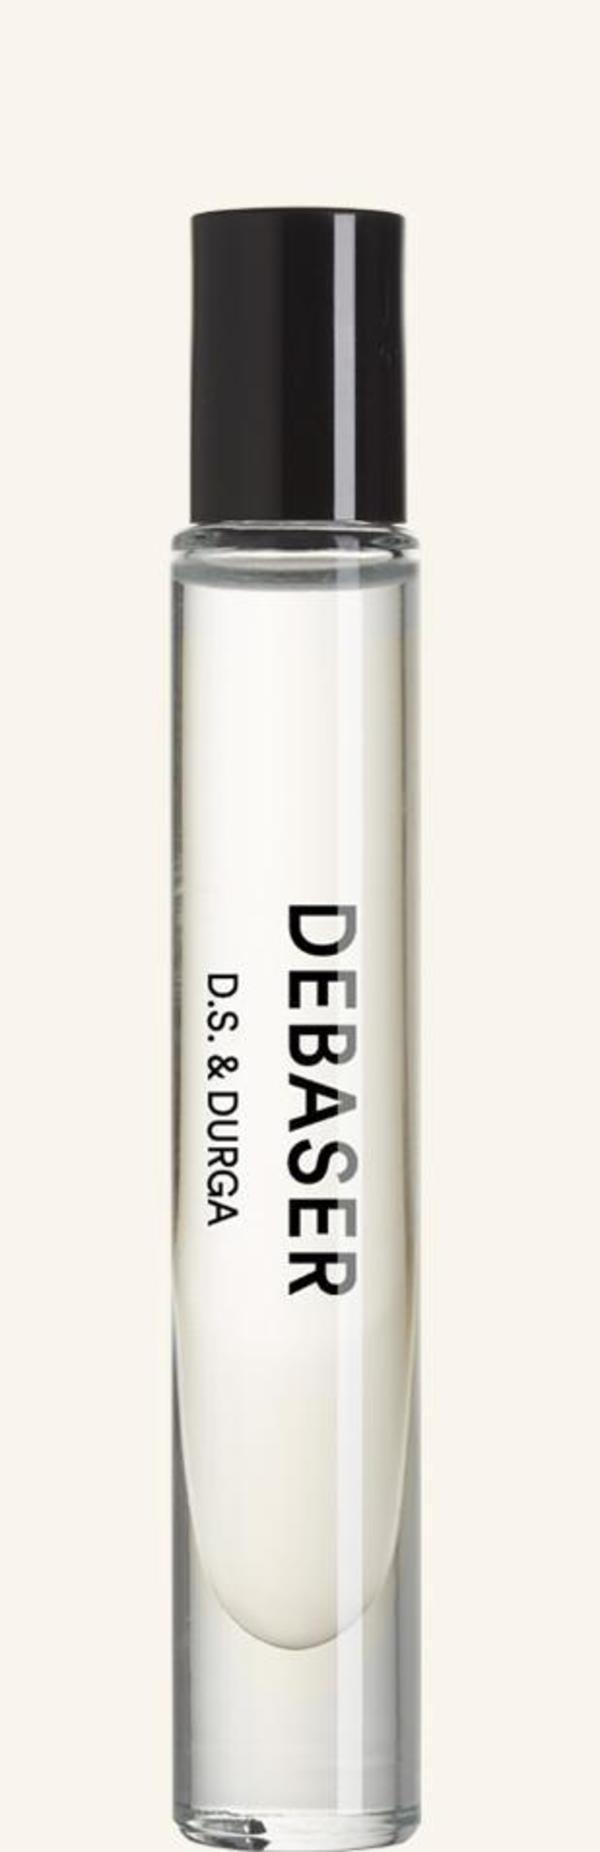 D.S. & Durga Debaser Pocket Perfume